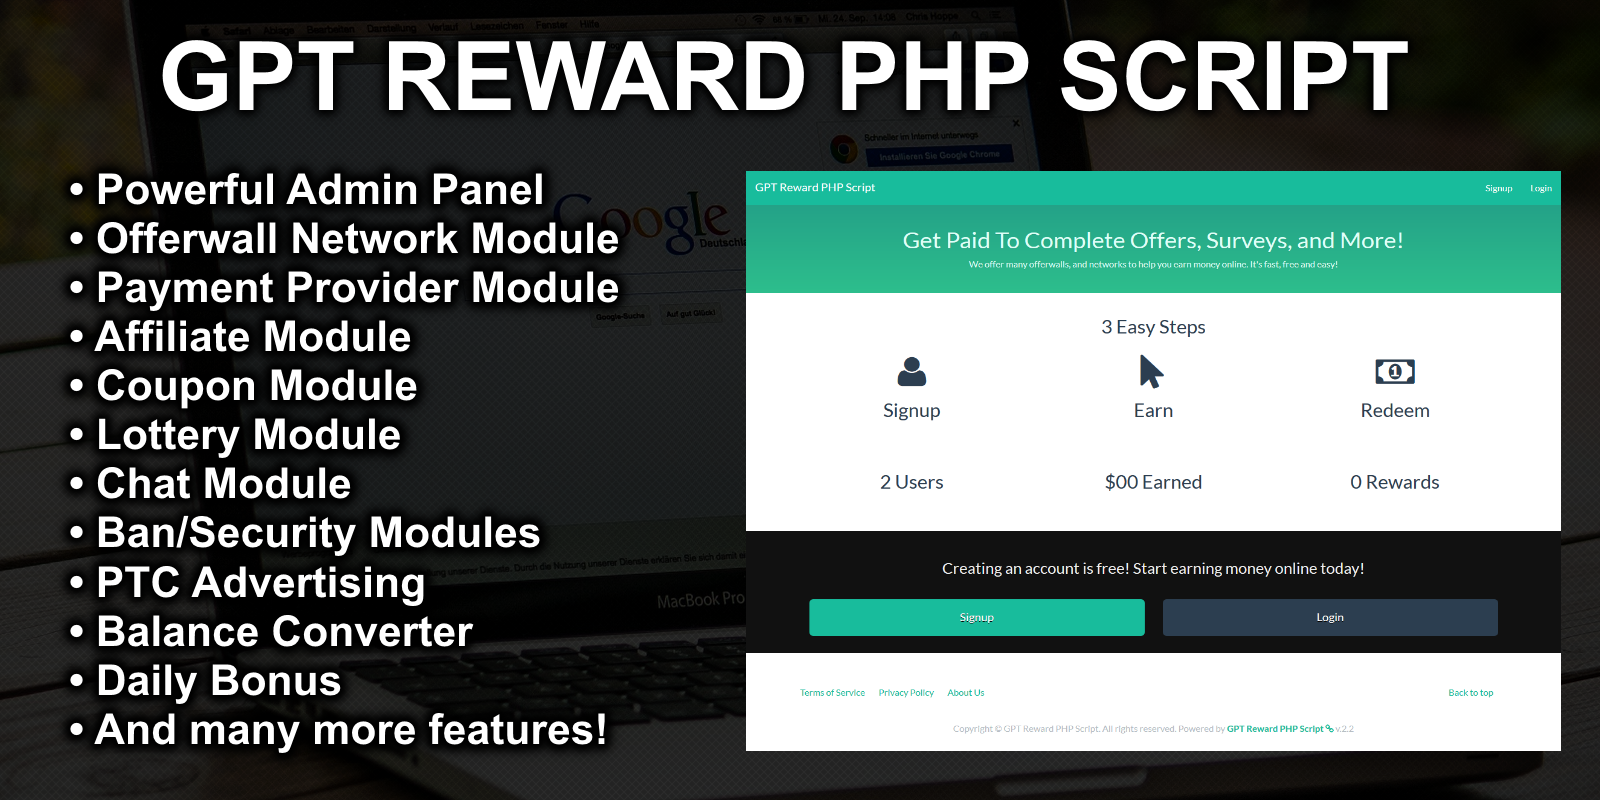 Create a GPT website with GPT Reward PHP Script